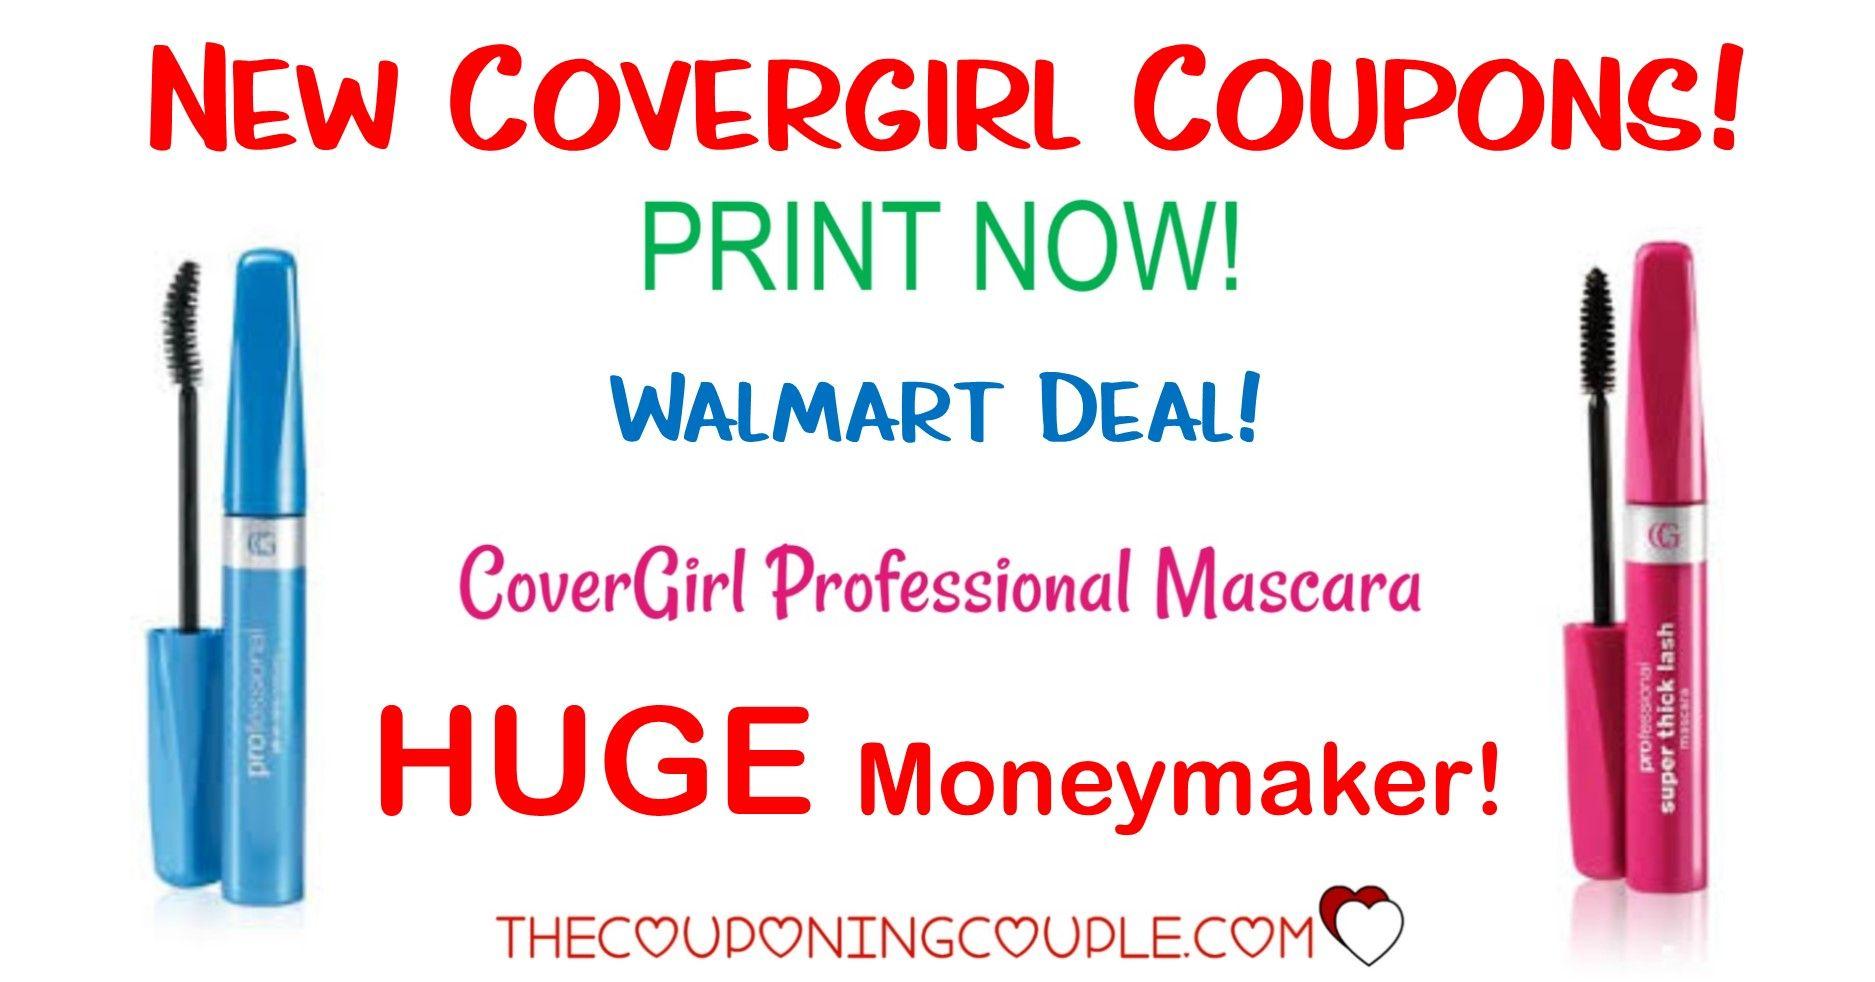 HOT BUY! Covergirl Professional Mascara Huge Moneymaker